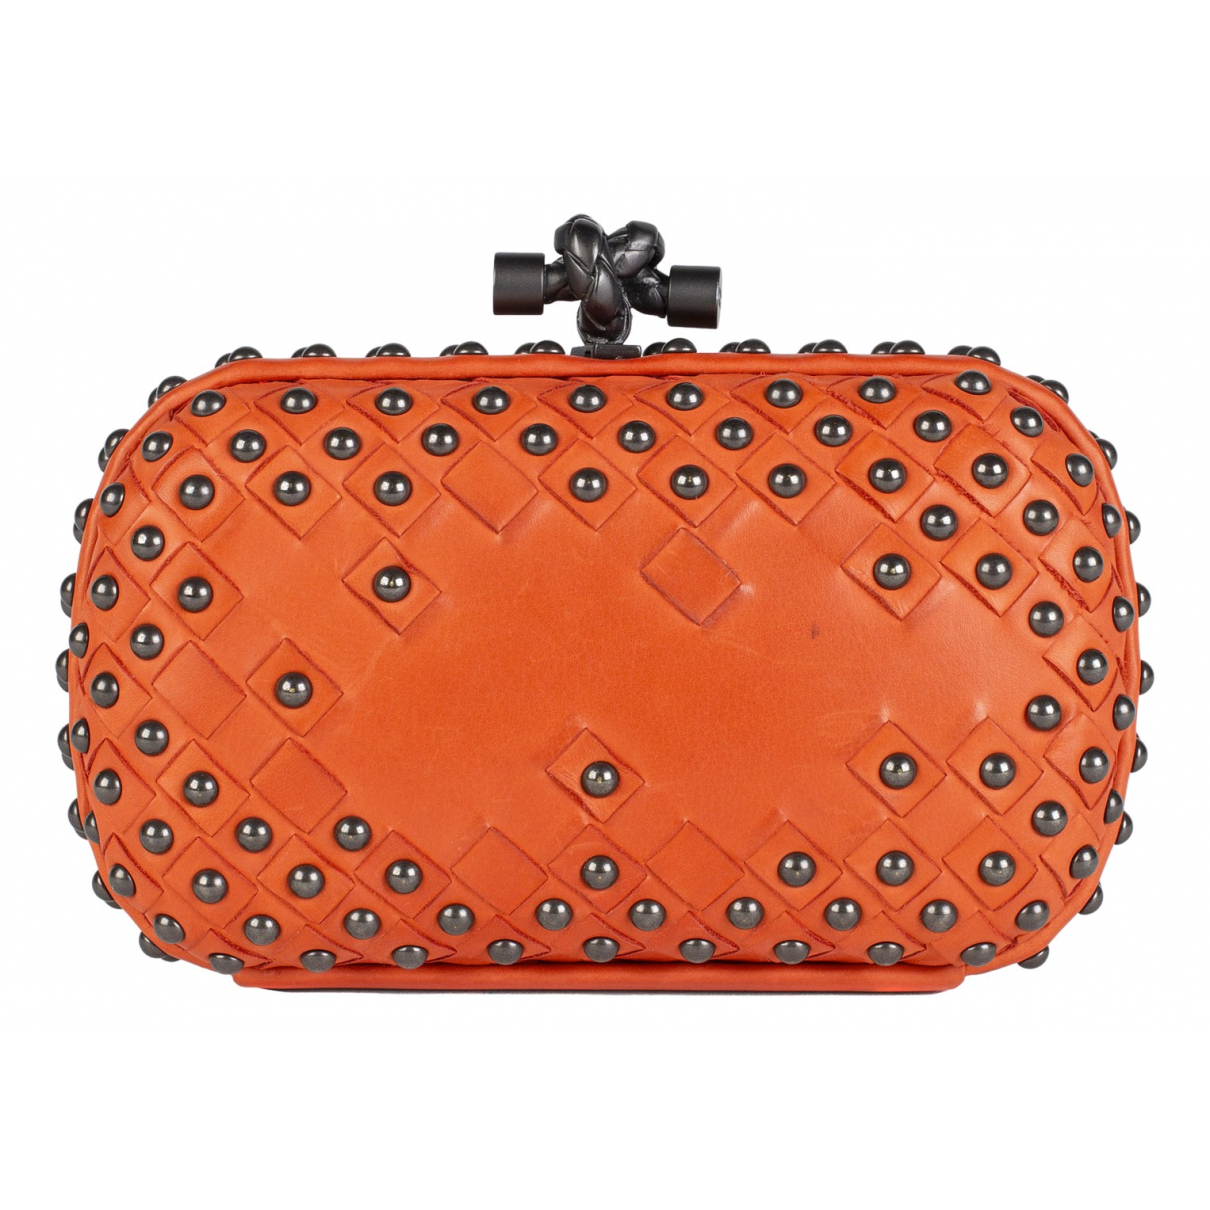 Bottega Veneta Pochette Knot Clutch in  Orange Leder